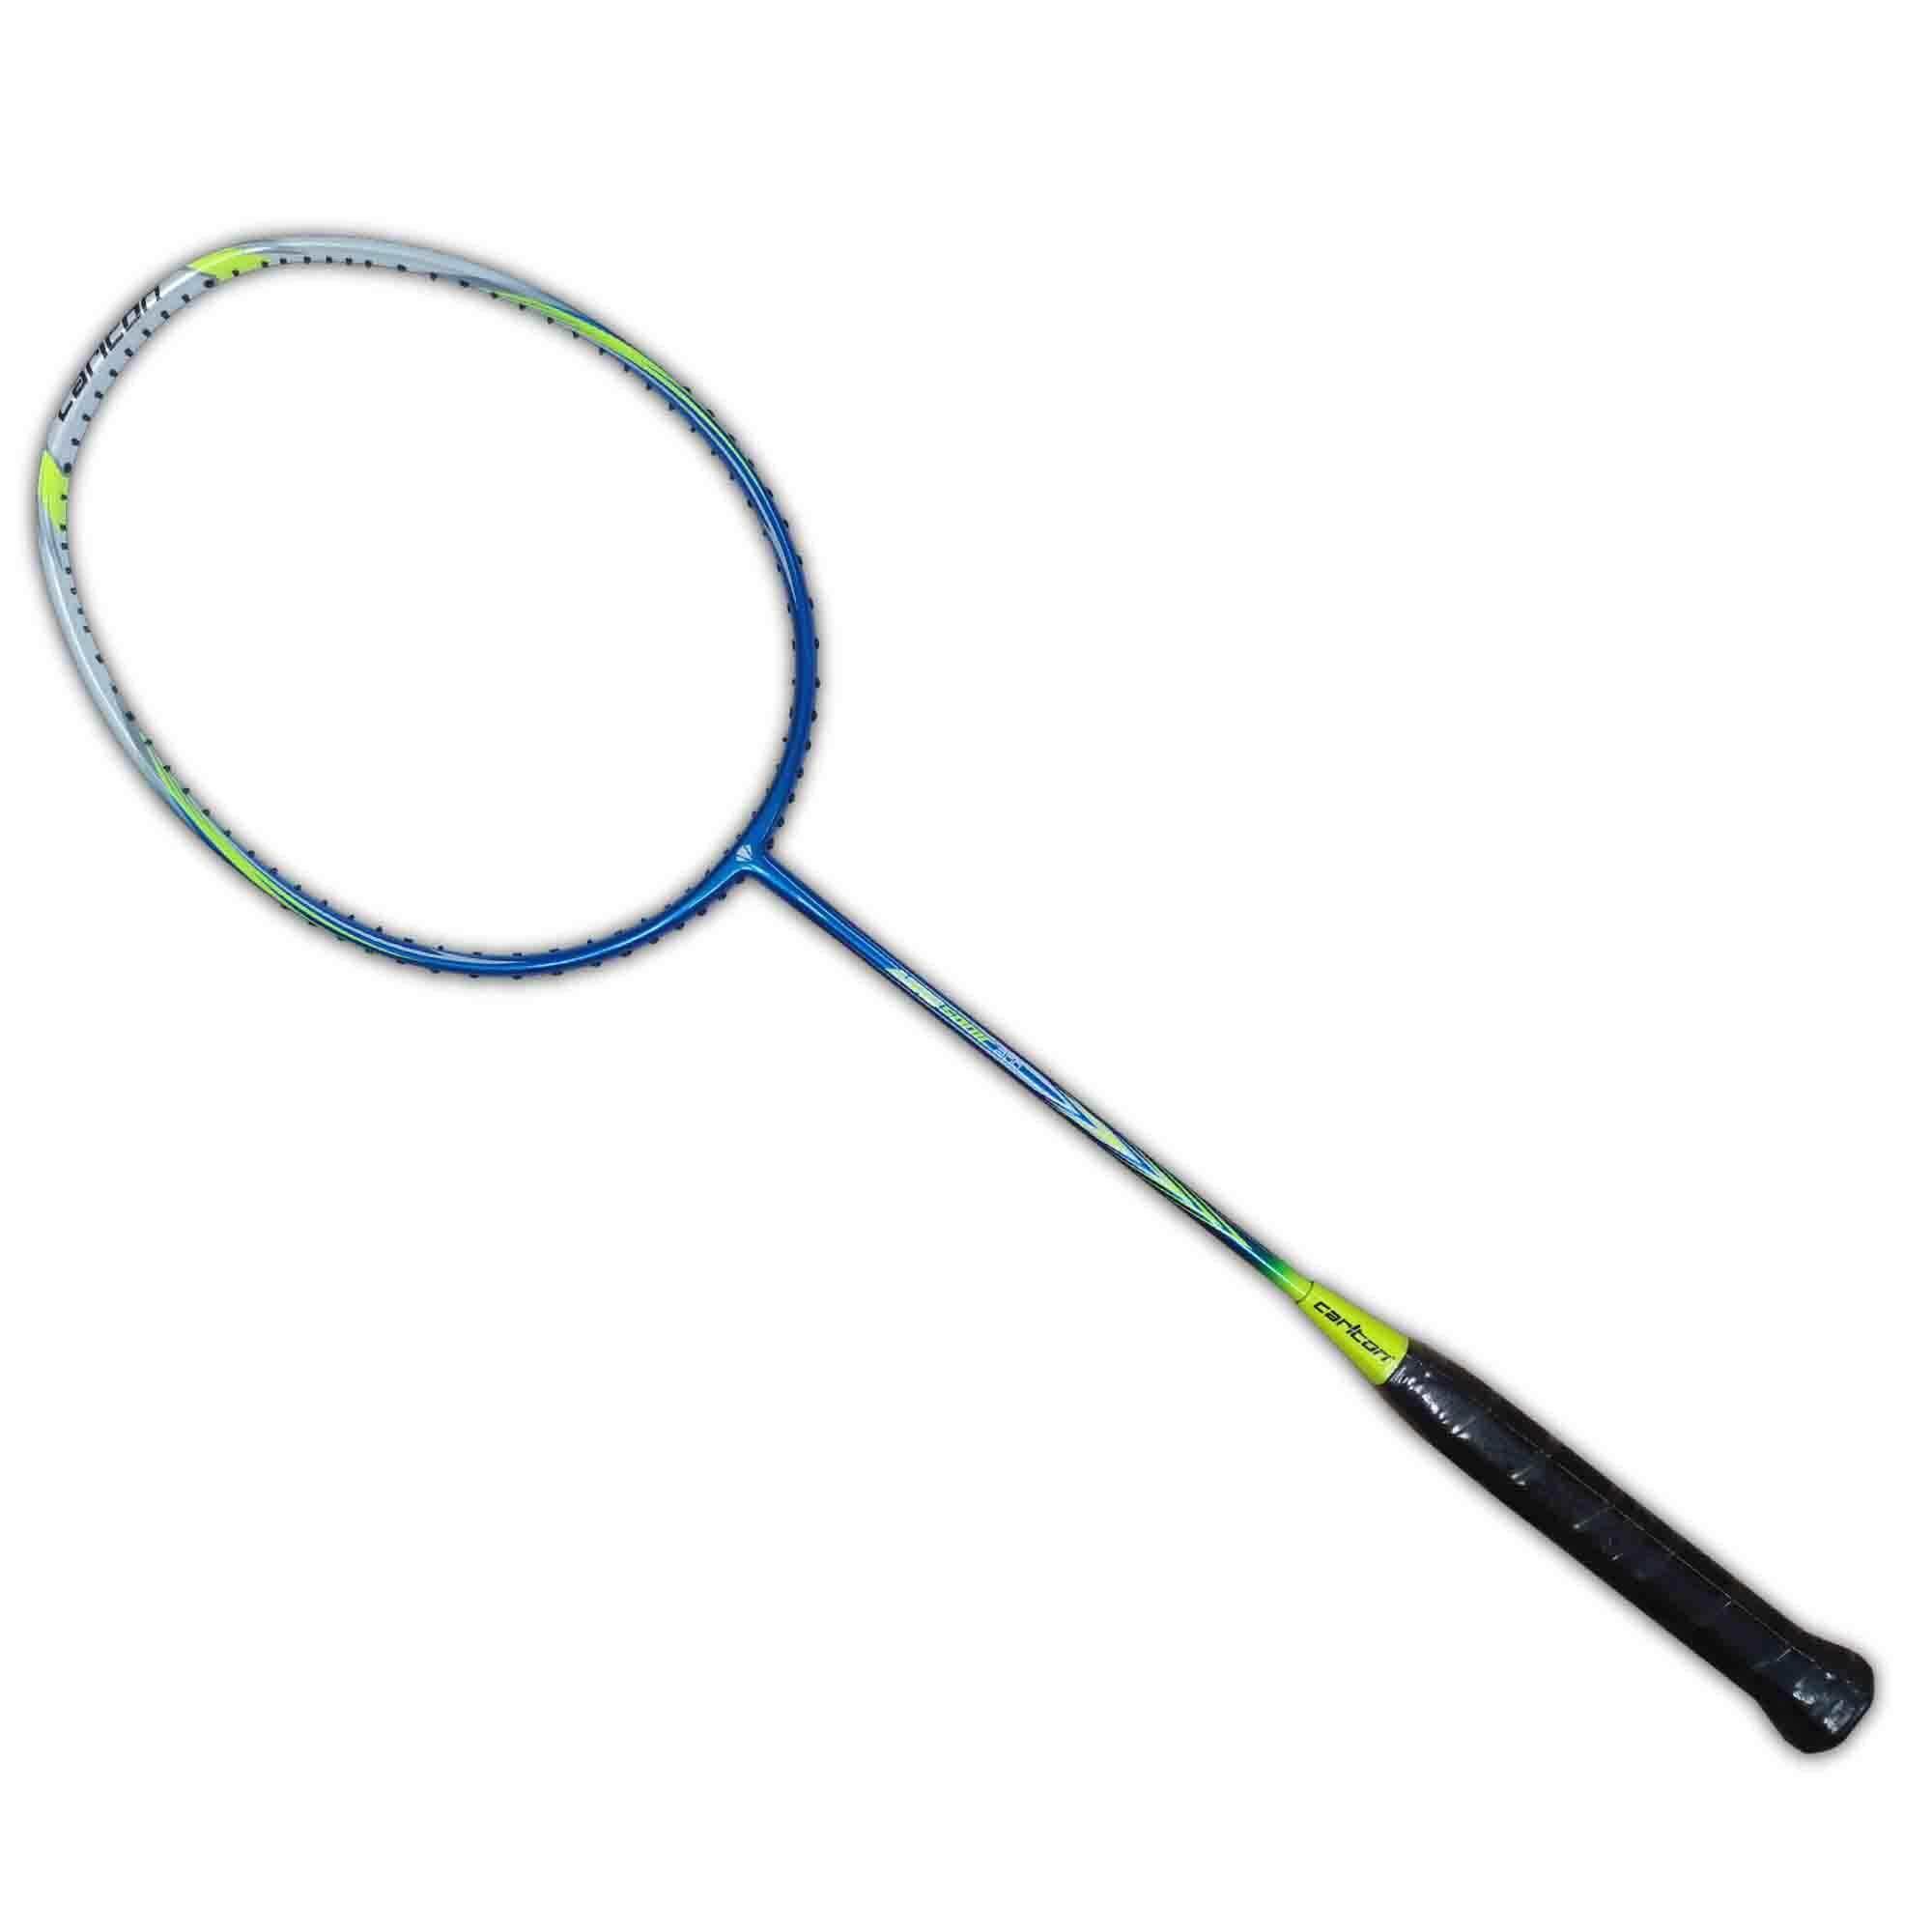 Carlton Badminton Racket Aerosonic 200